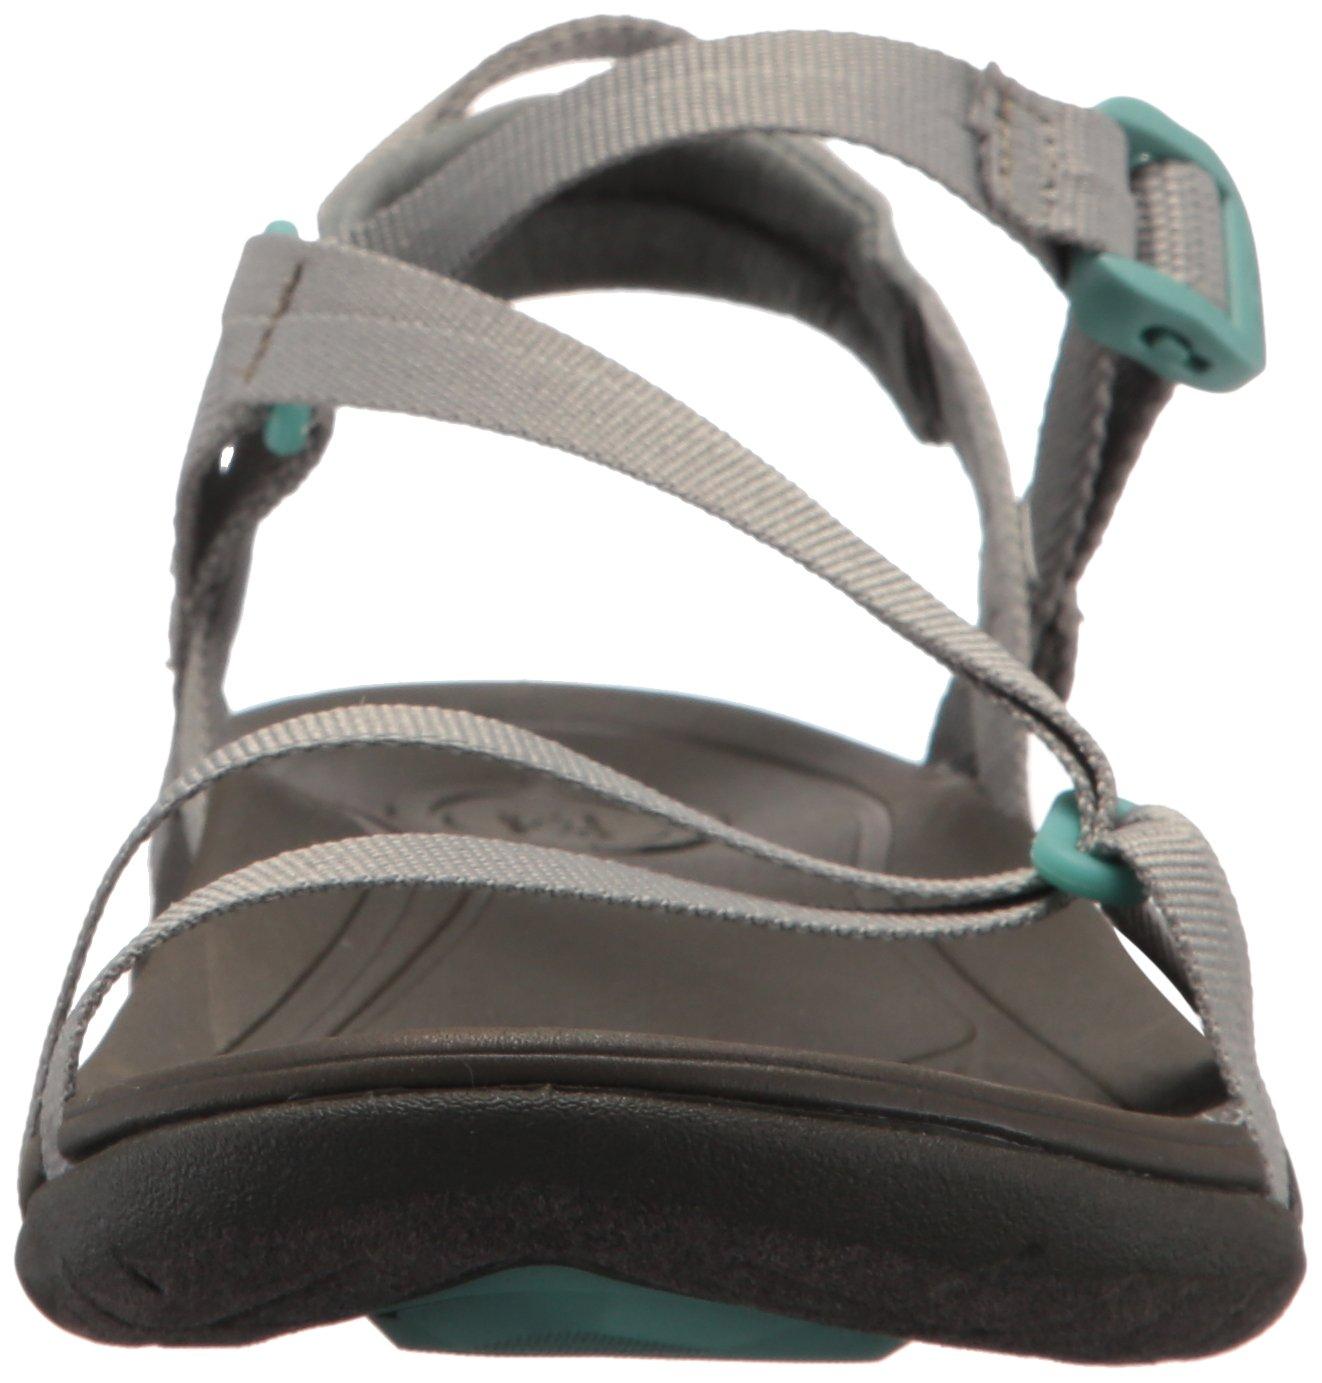 Teva Womens Sandal Women's W Sirra Sport Sandal Womens B071WML6HD 6 B(M) US|Desert Sage acb20d